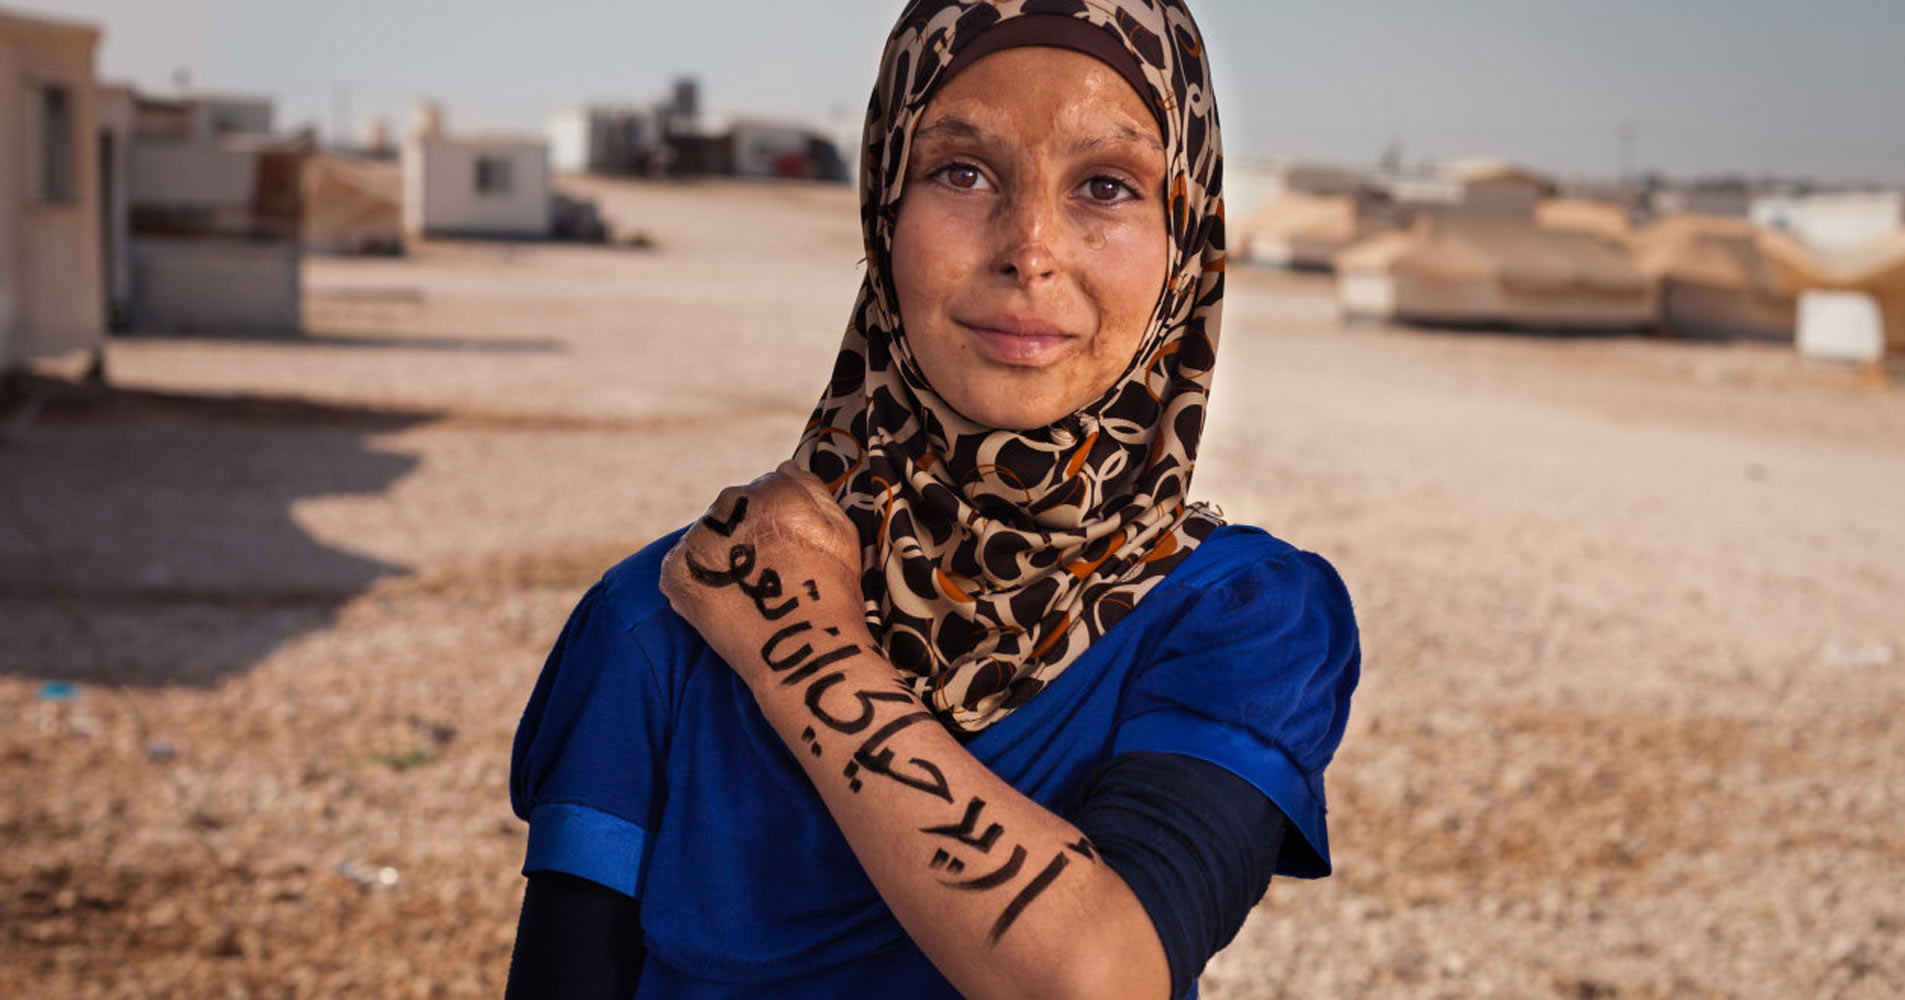 аспирации самая красивая сирийка фото крае